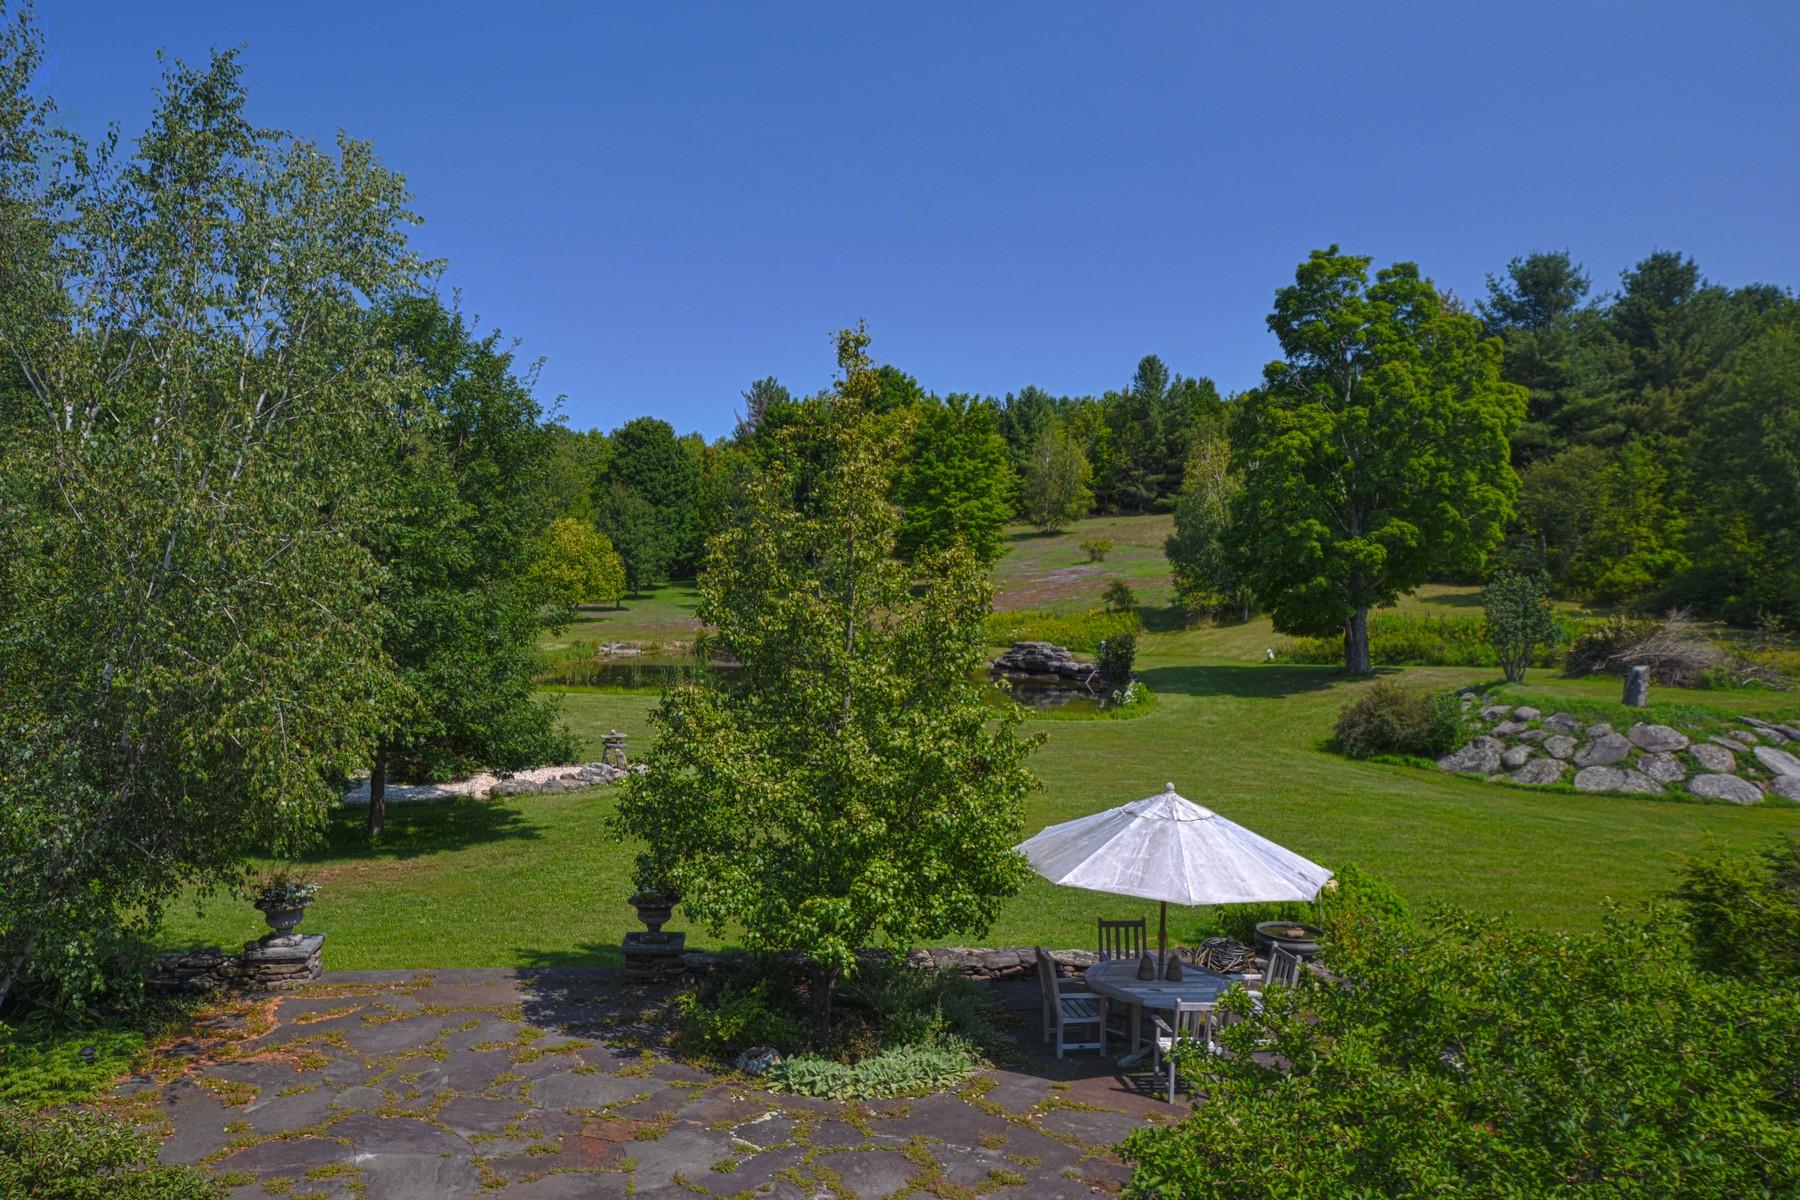 Additional photo for property listing at Deercroft 2304  Route 23c East Jewett, Nueva York 12424 Estados Unidos